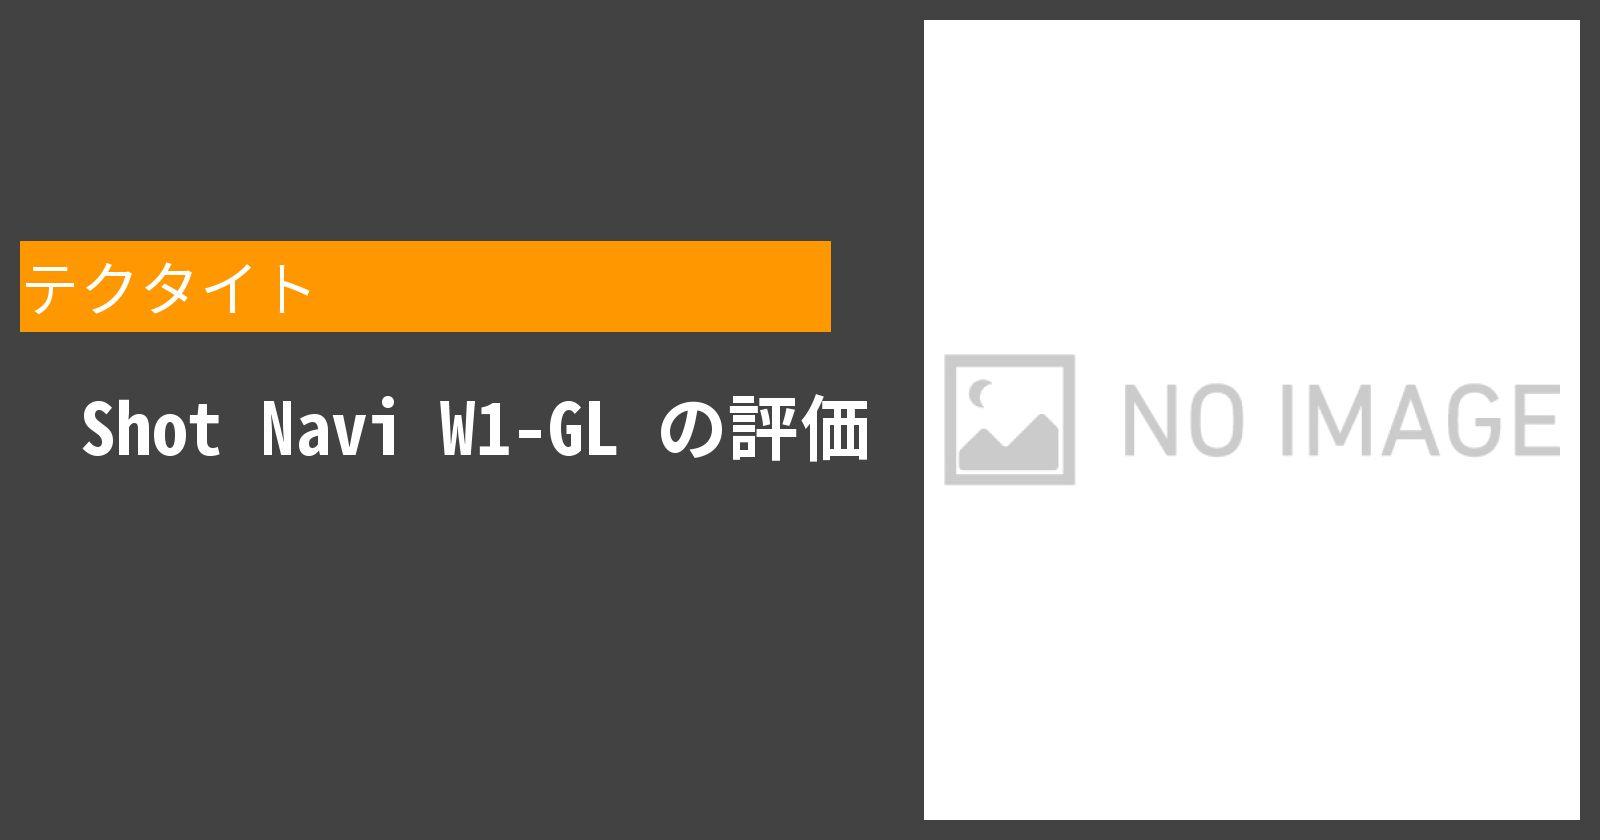 Shot Navi W1-GLを徹底評価